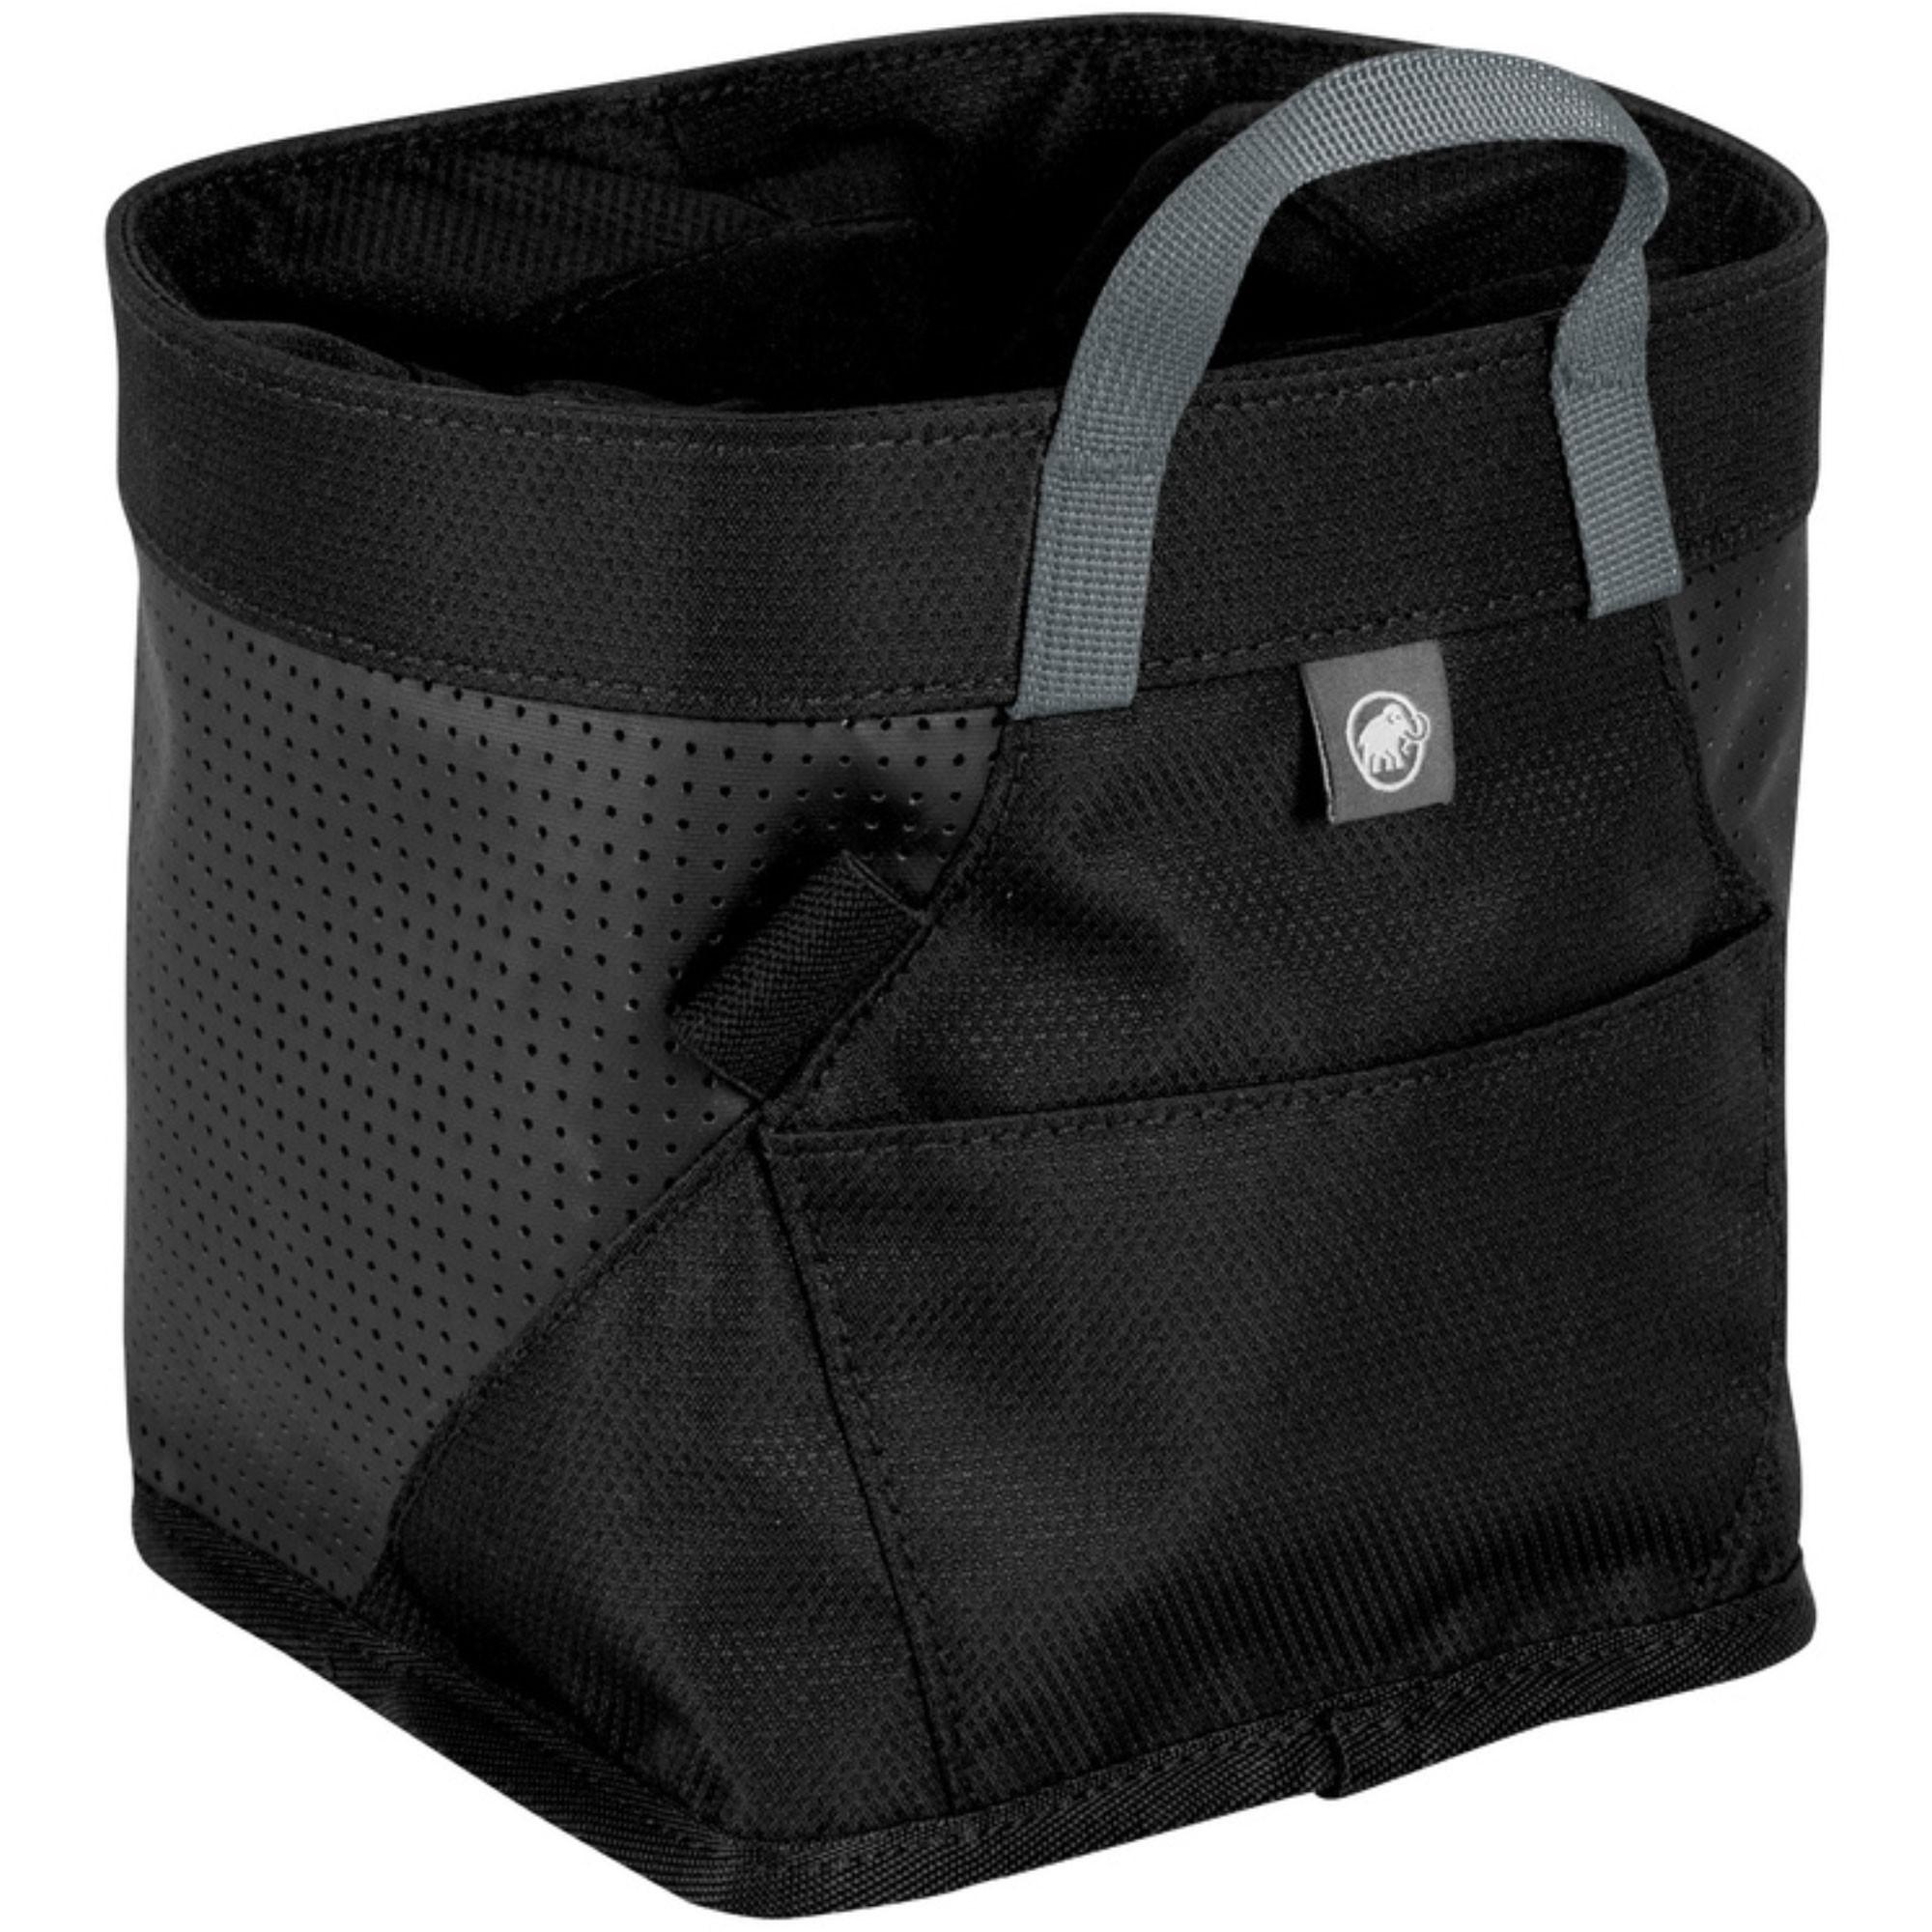 Mammut Stitch Boulder Chalk Bag - Black